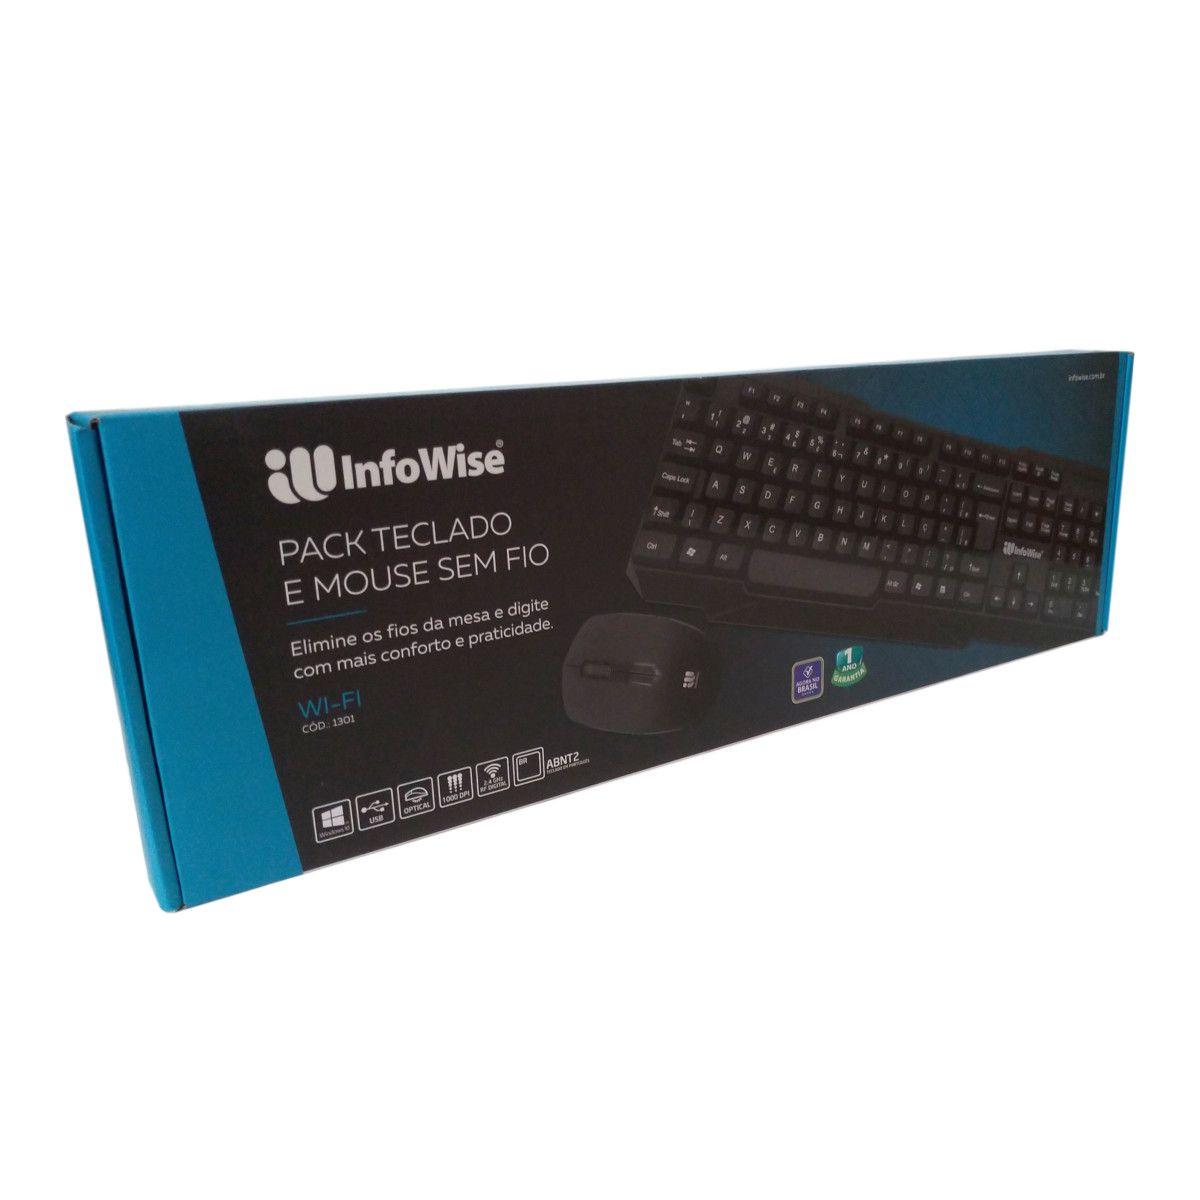 Teclado e Mouse Sem Fio 2.4Ghz 1301 infowise (Preto)